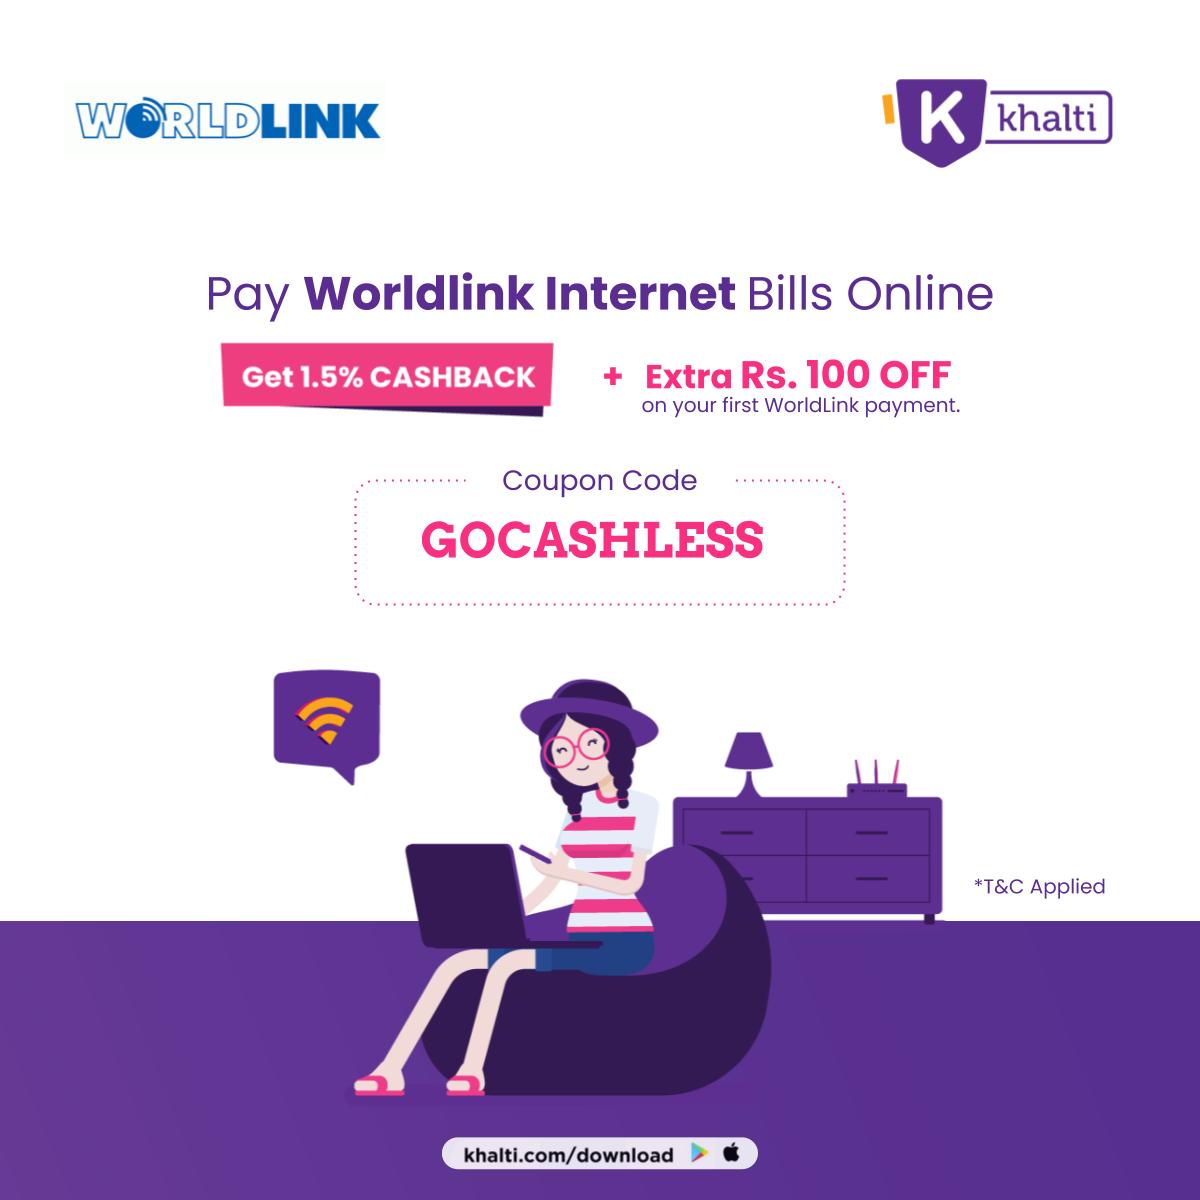 khalti worldlink payment nepali coupons